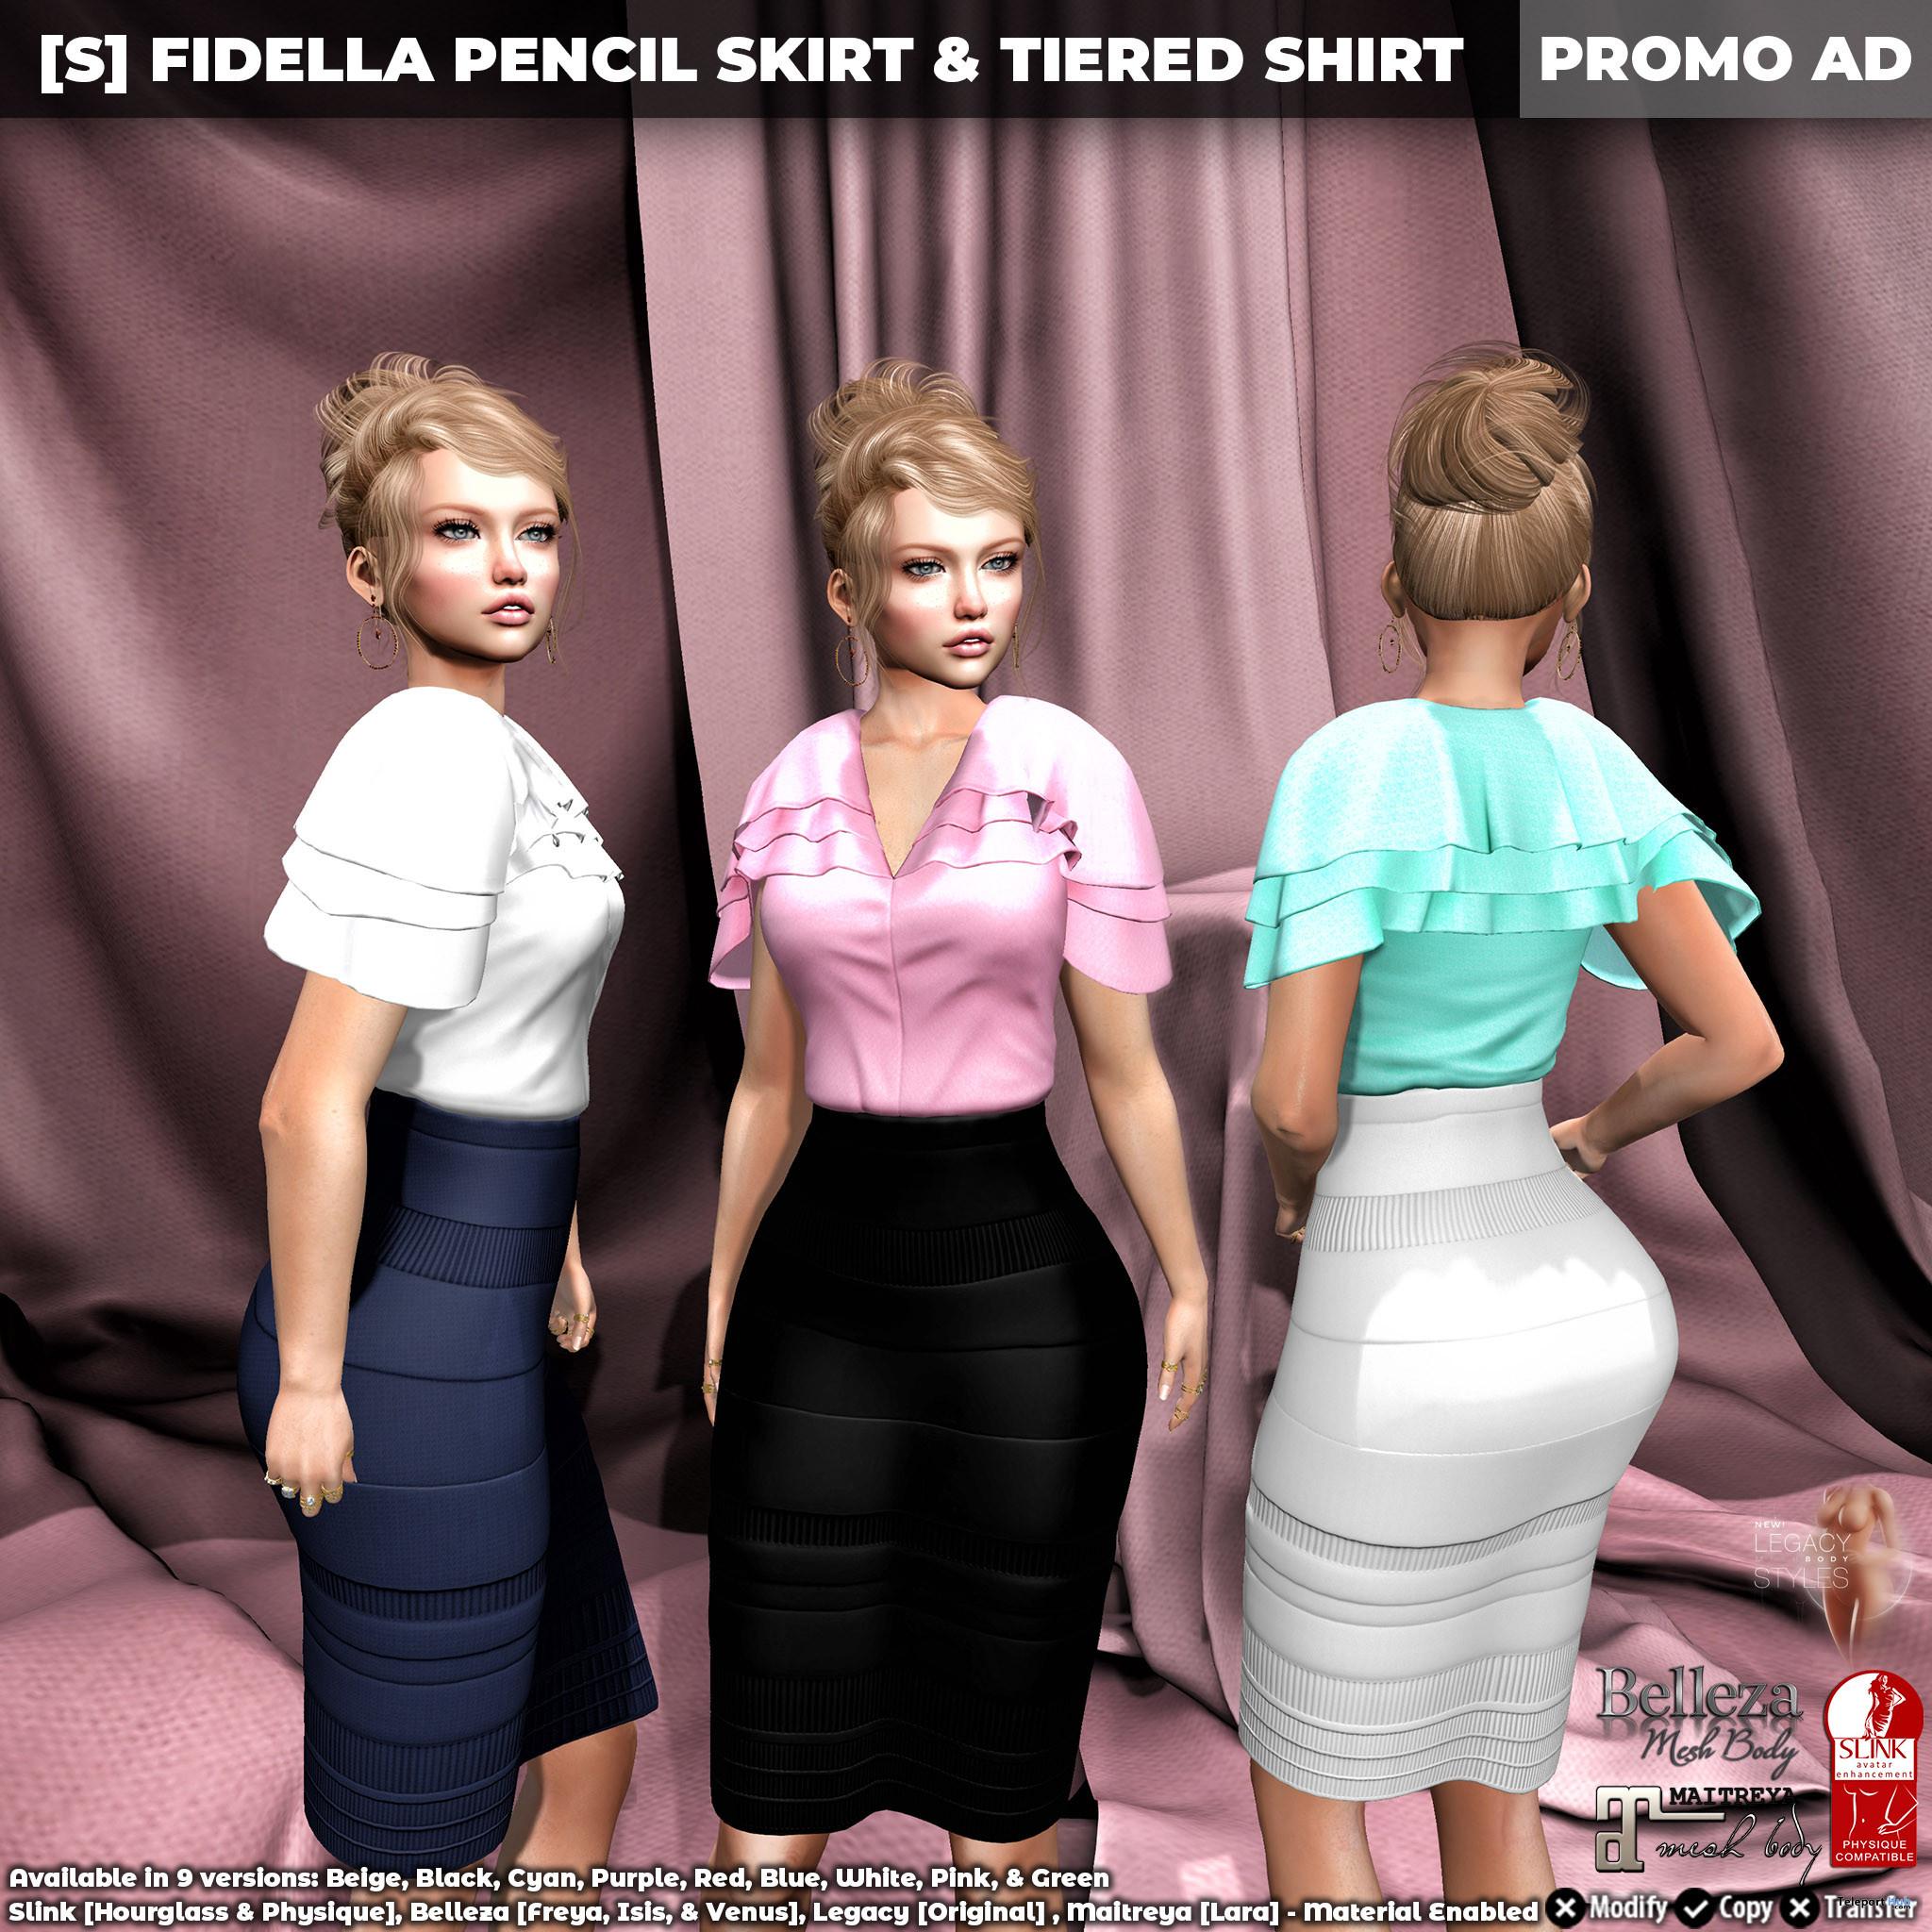 New Release: [S] Fidella Pencil Skirt & Tiered Shirt by [satus Inc] - Teleport Hub - teleporthub.com